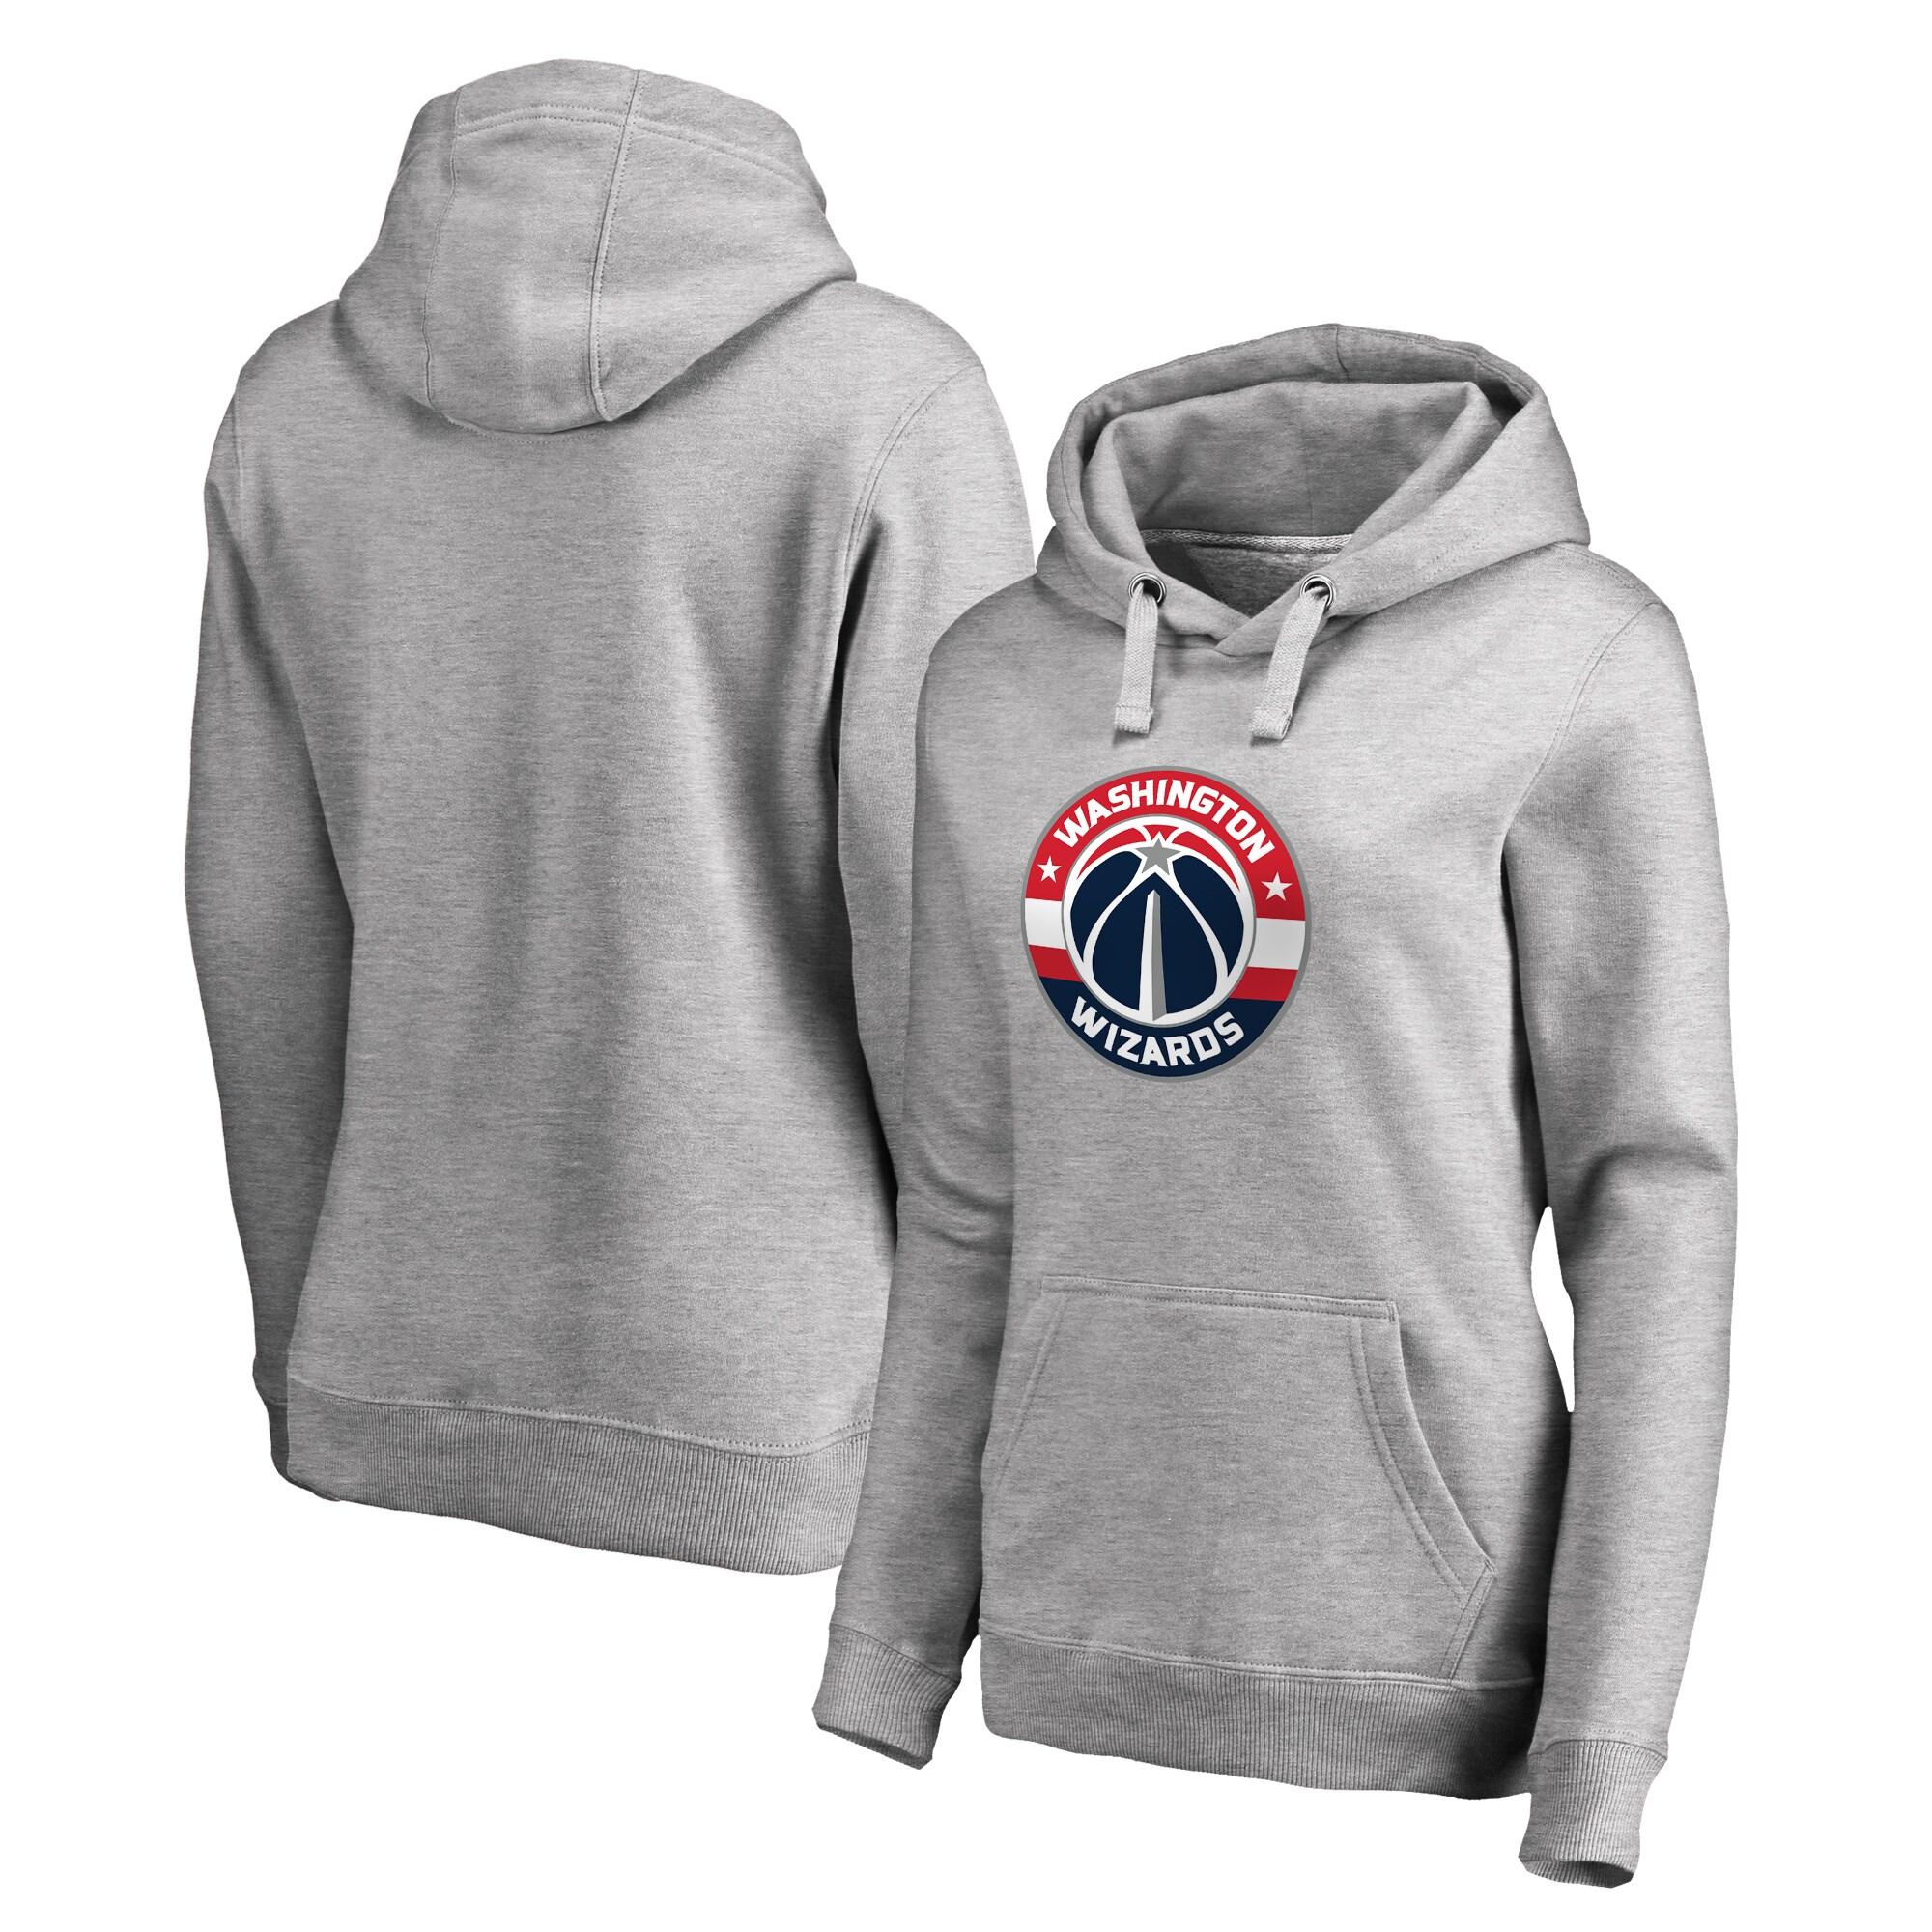 Washington Wizards Fanatics Branded Women's Plus Sizes Team Primary Logo Pullover Hoodie - Ash